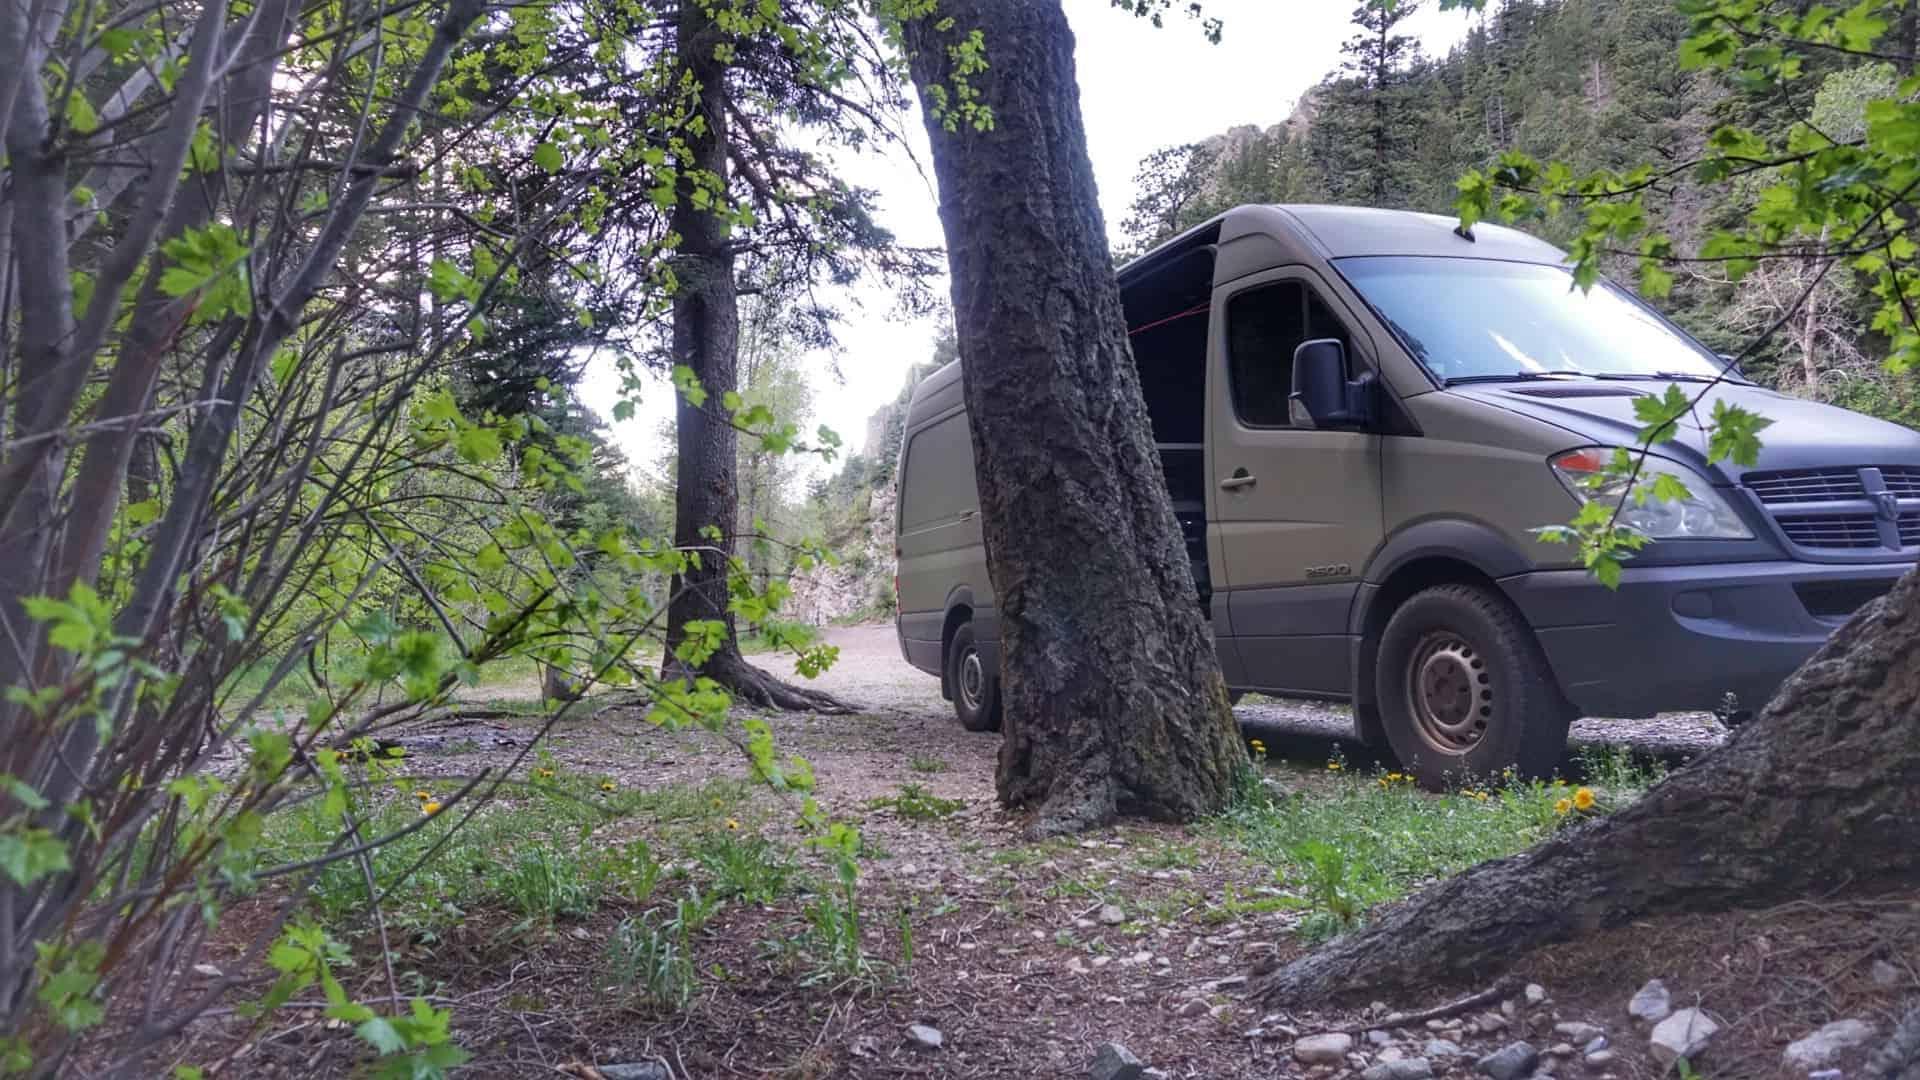 Boondocking-Campsite-Taos-Ski-Valley-8